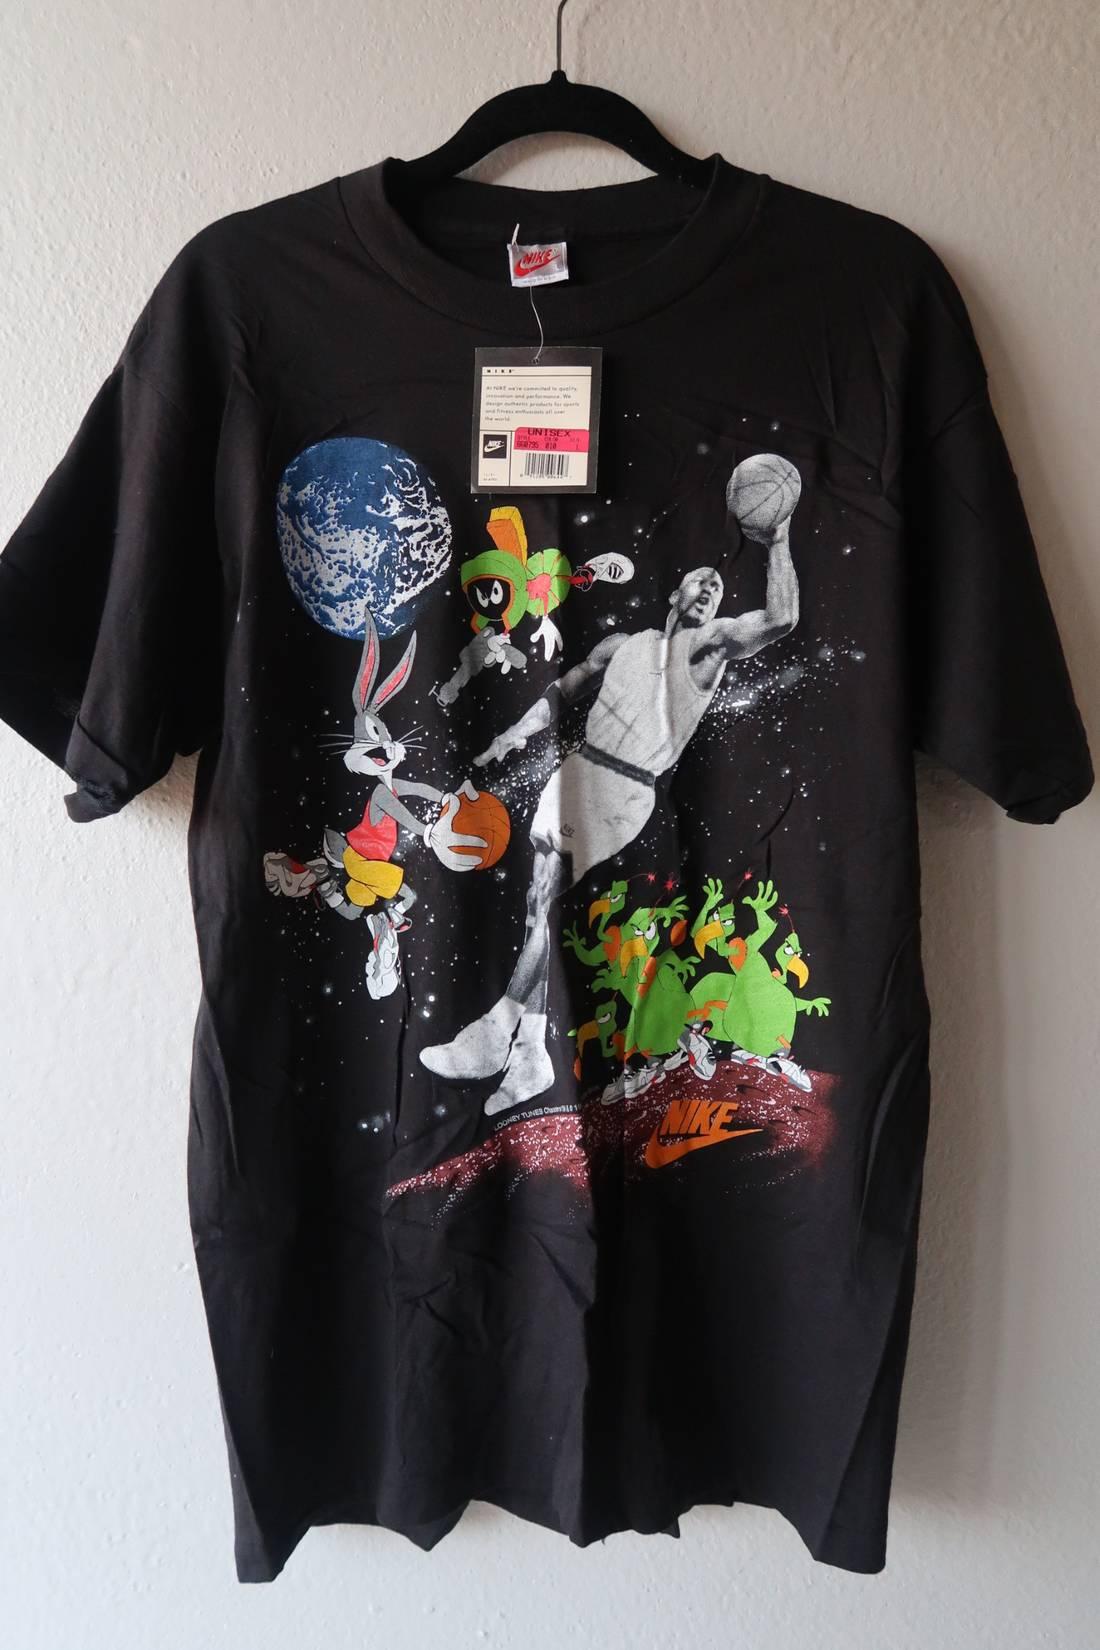 b07843120cda1f Space Jam 11 Shirts